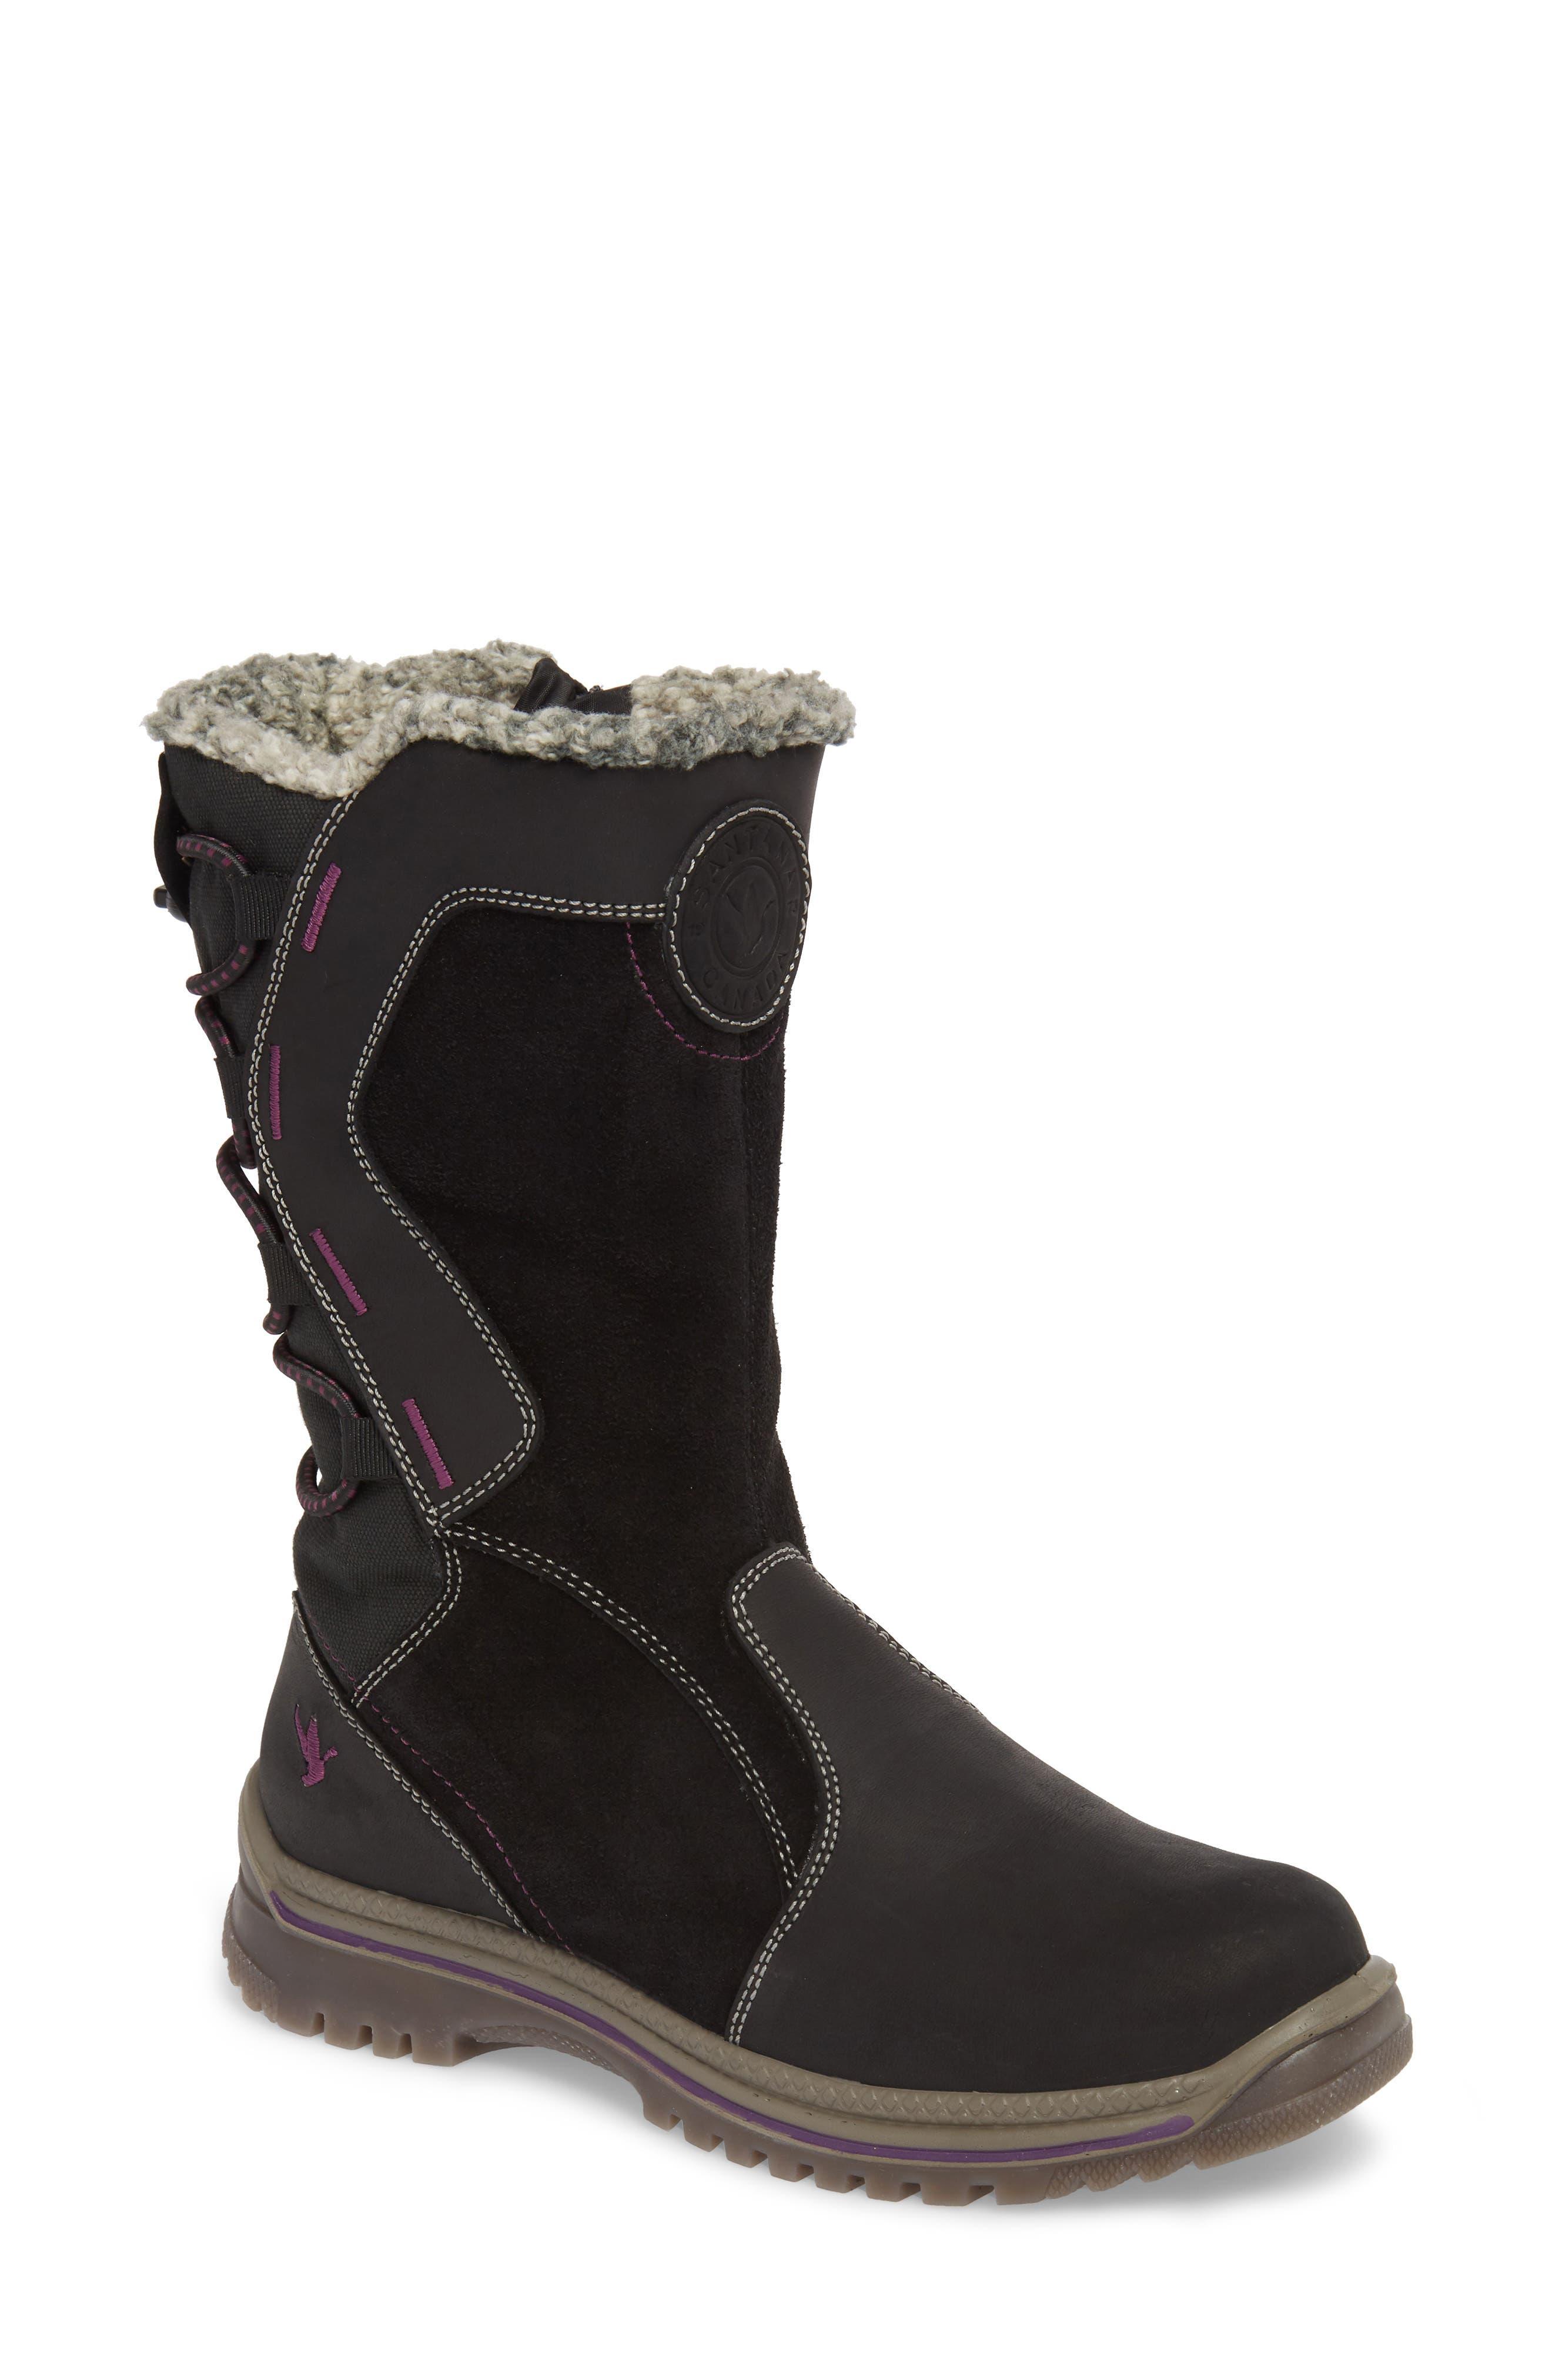 Santana Canada Mayer2 Waterproof Winter Boot, Black